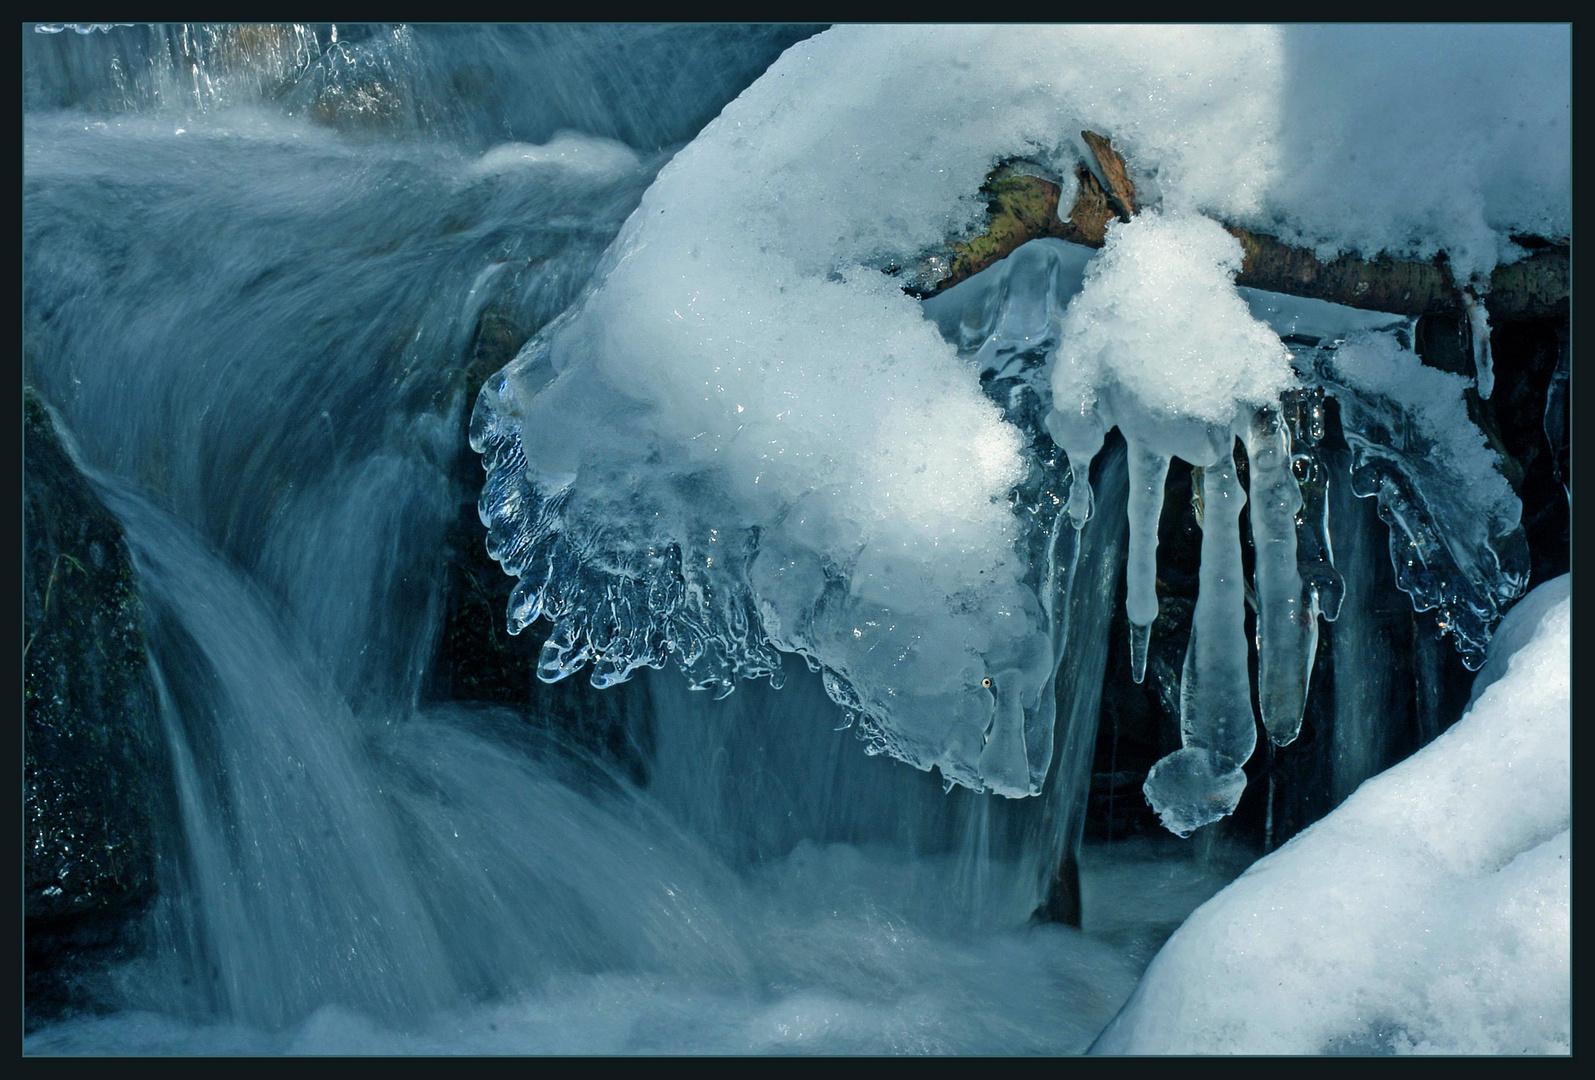 Leben im Eis ?